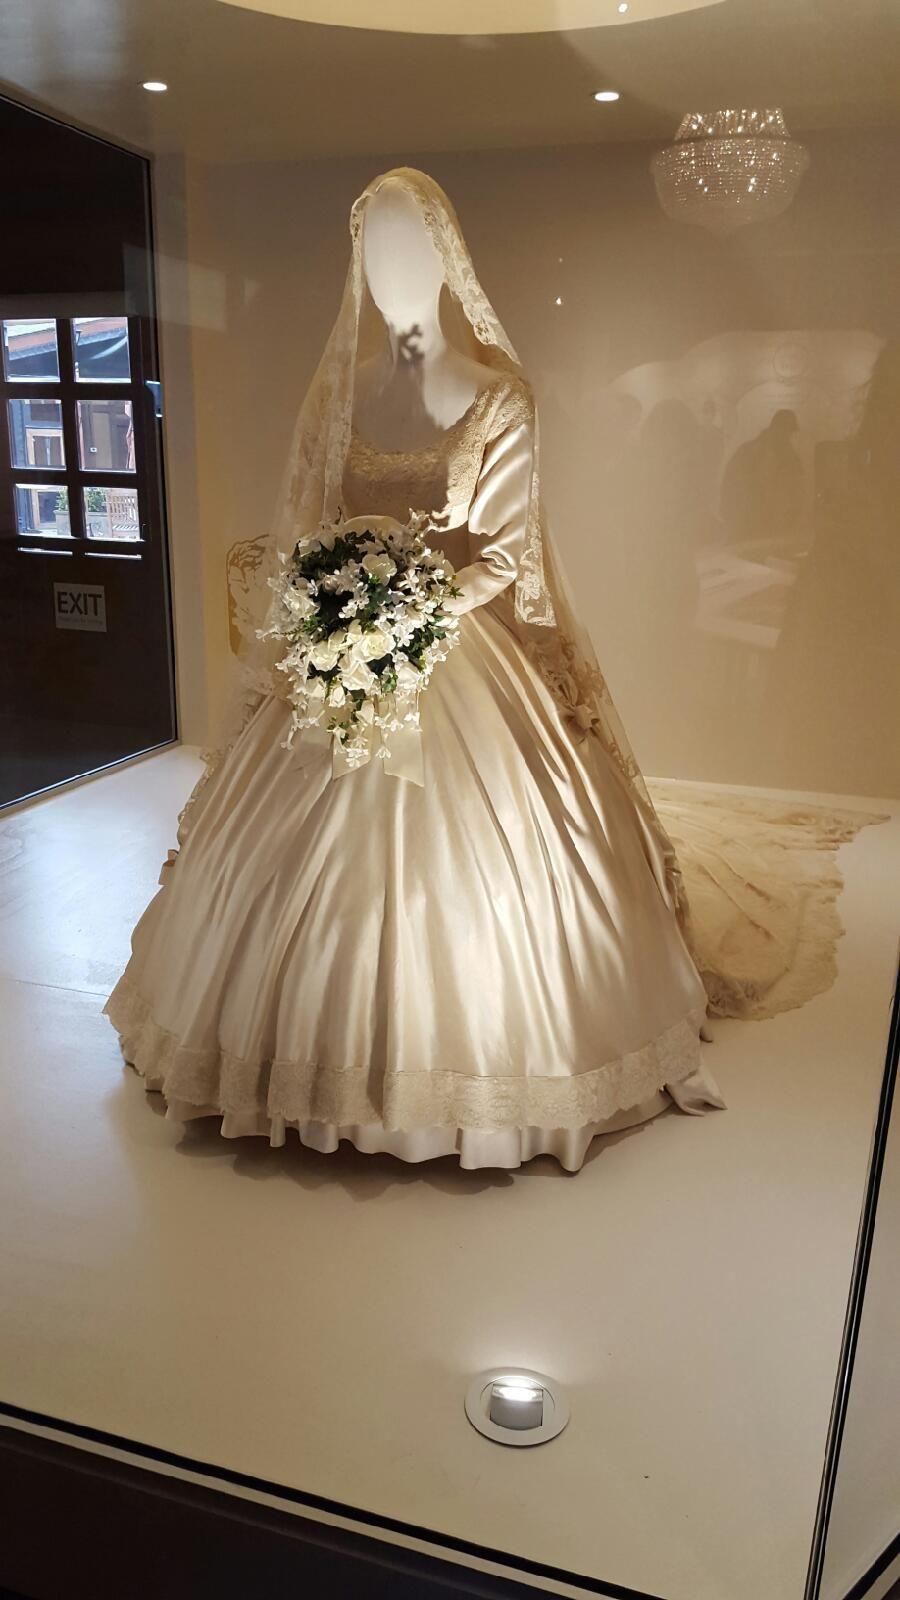 Lee Family veil (worn by Jacqueline Bouvier when she married Senator ...